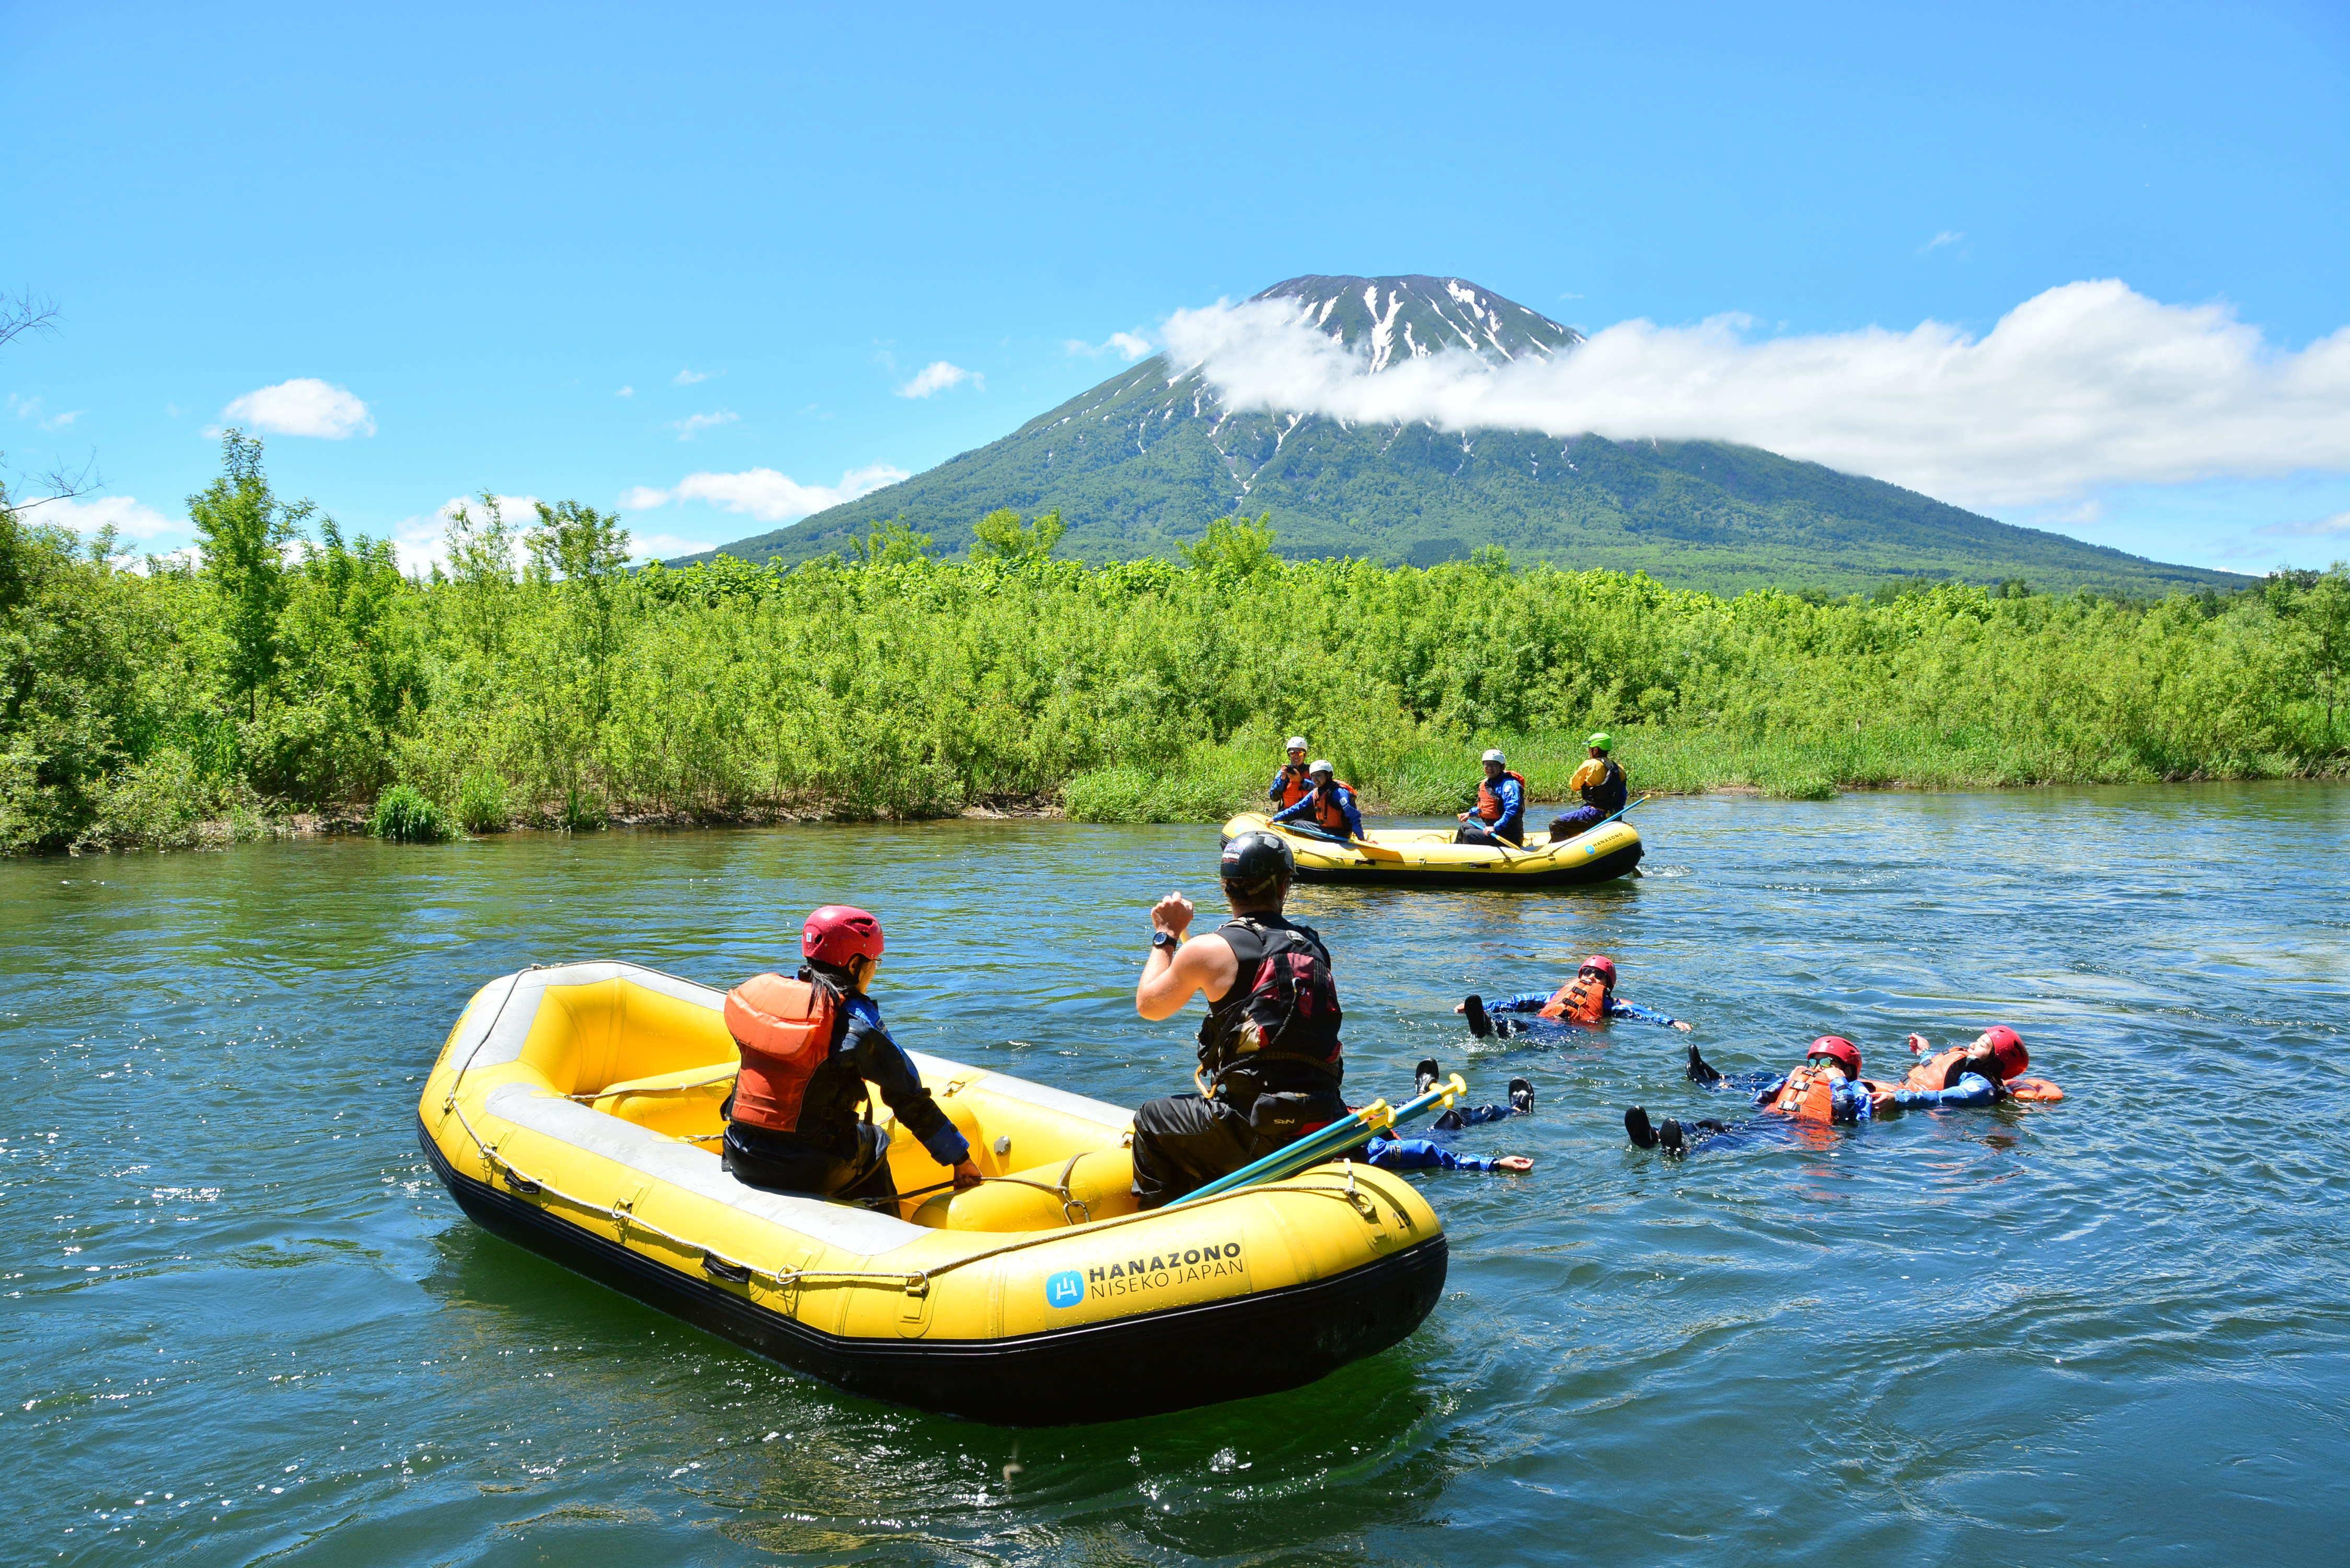 Hanazono Rafting